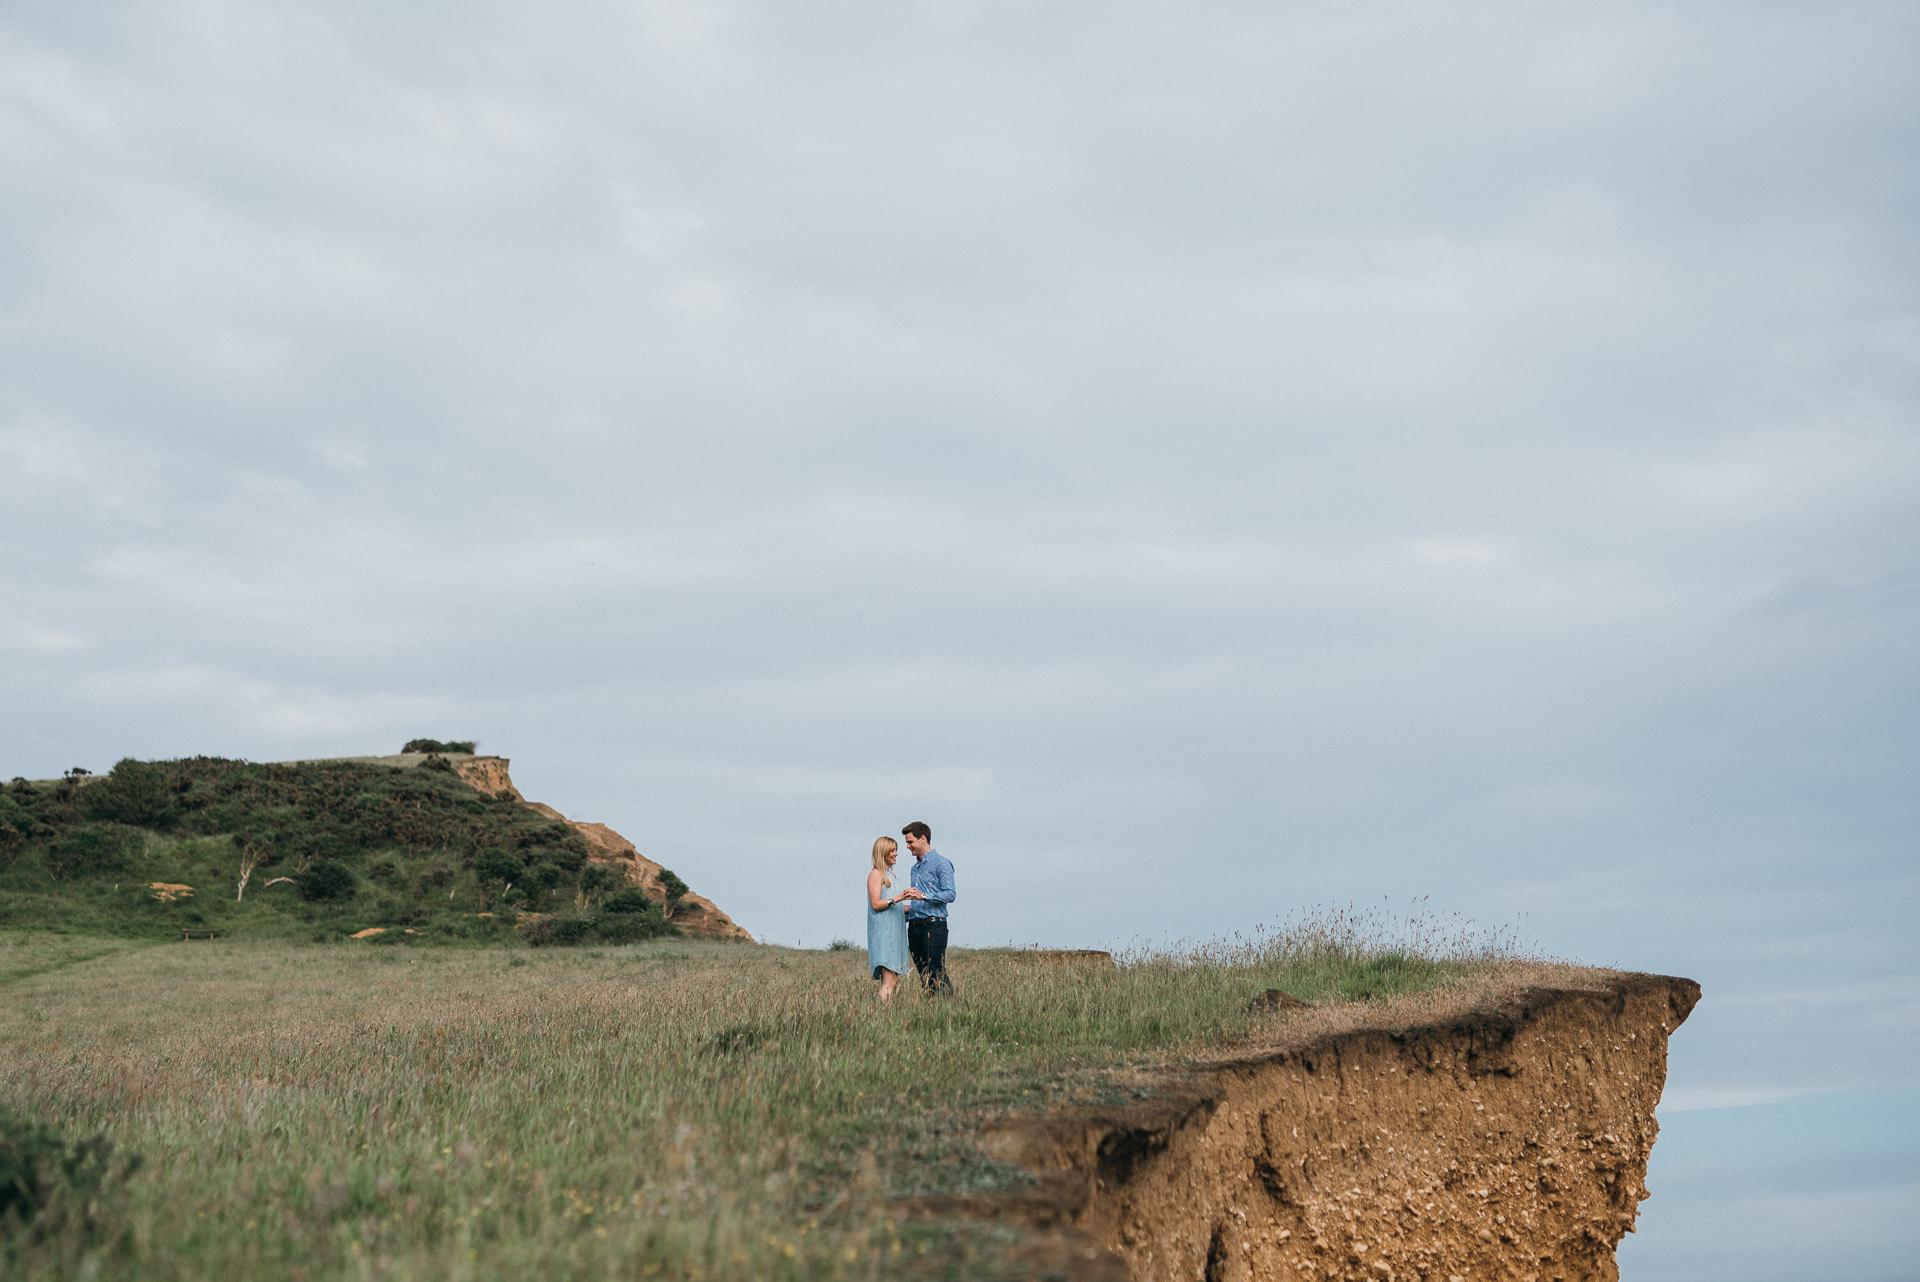 Jurassic coast portrait shoot 4